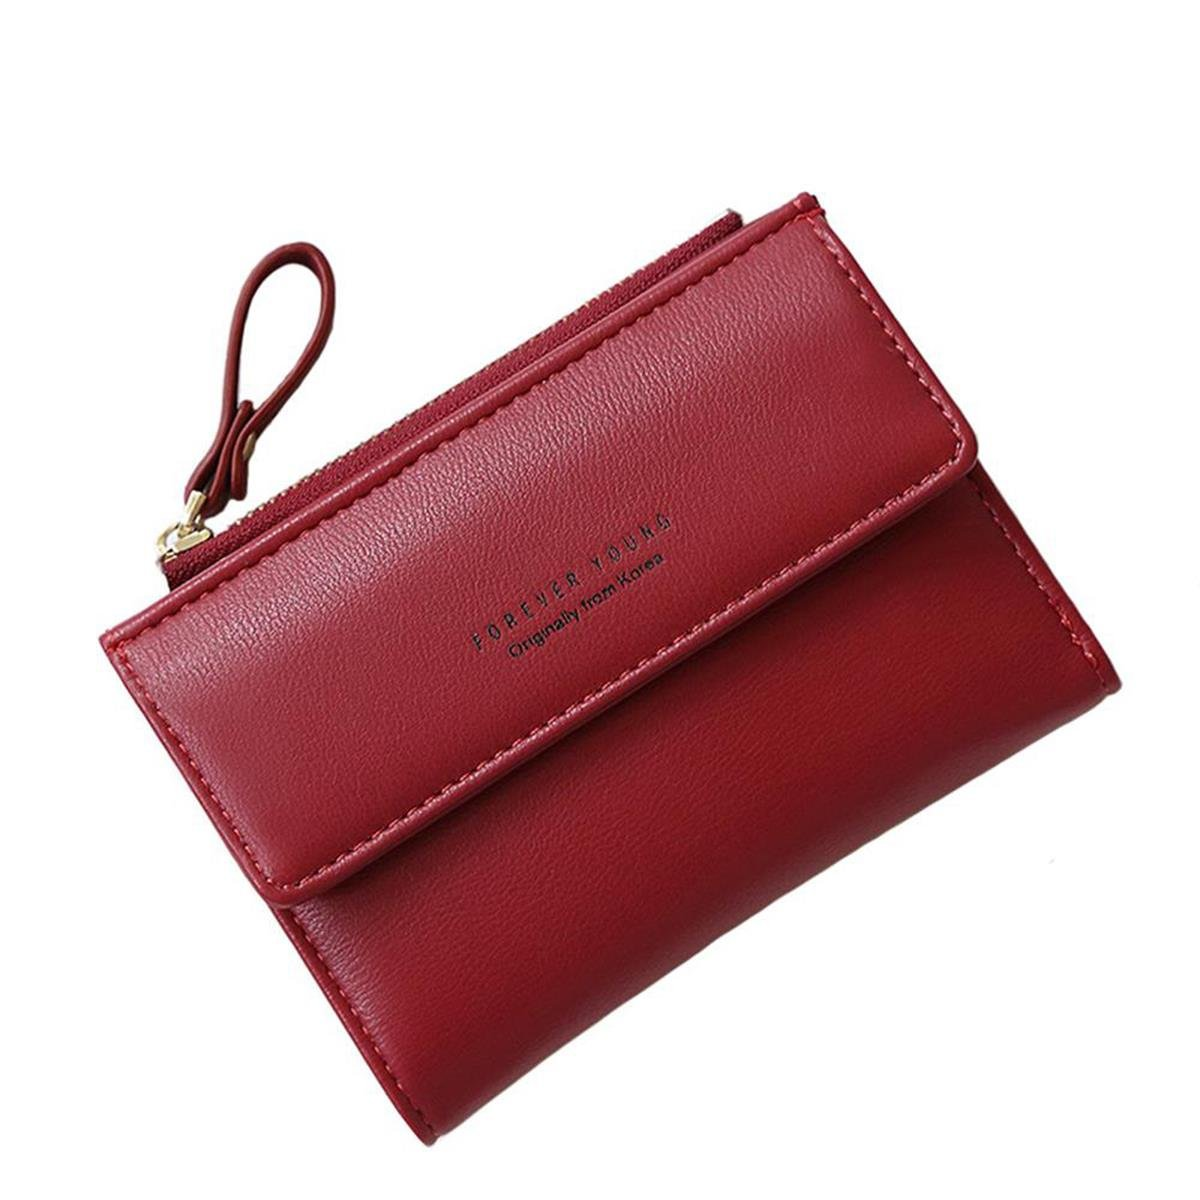 Women Small Wallet Lady Mini Purse Bifold Leather Short Wallet RFID Blocking with ID Window (B-Wine red)